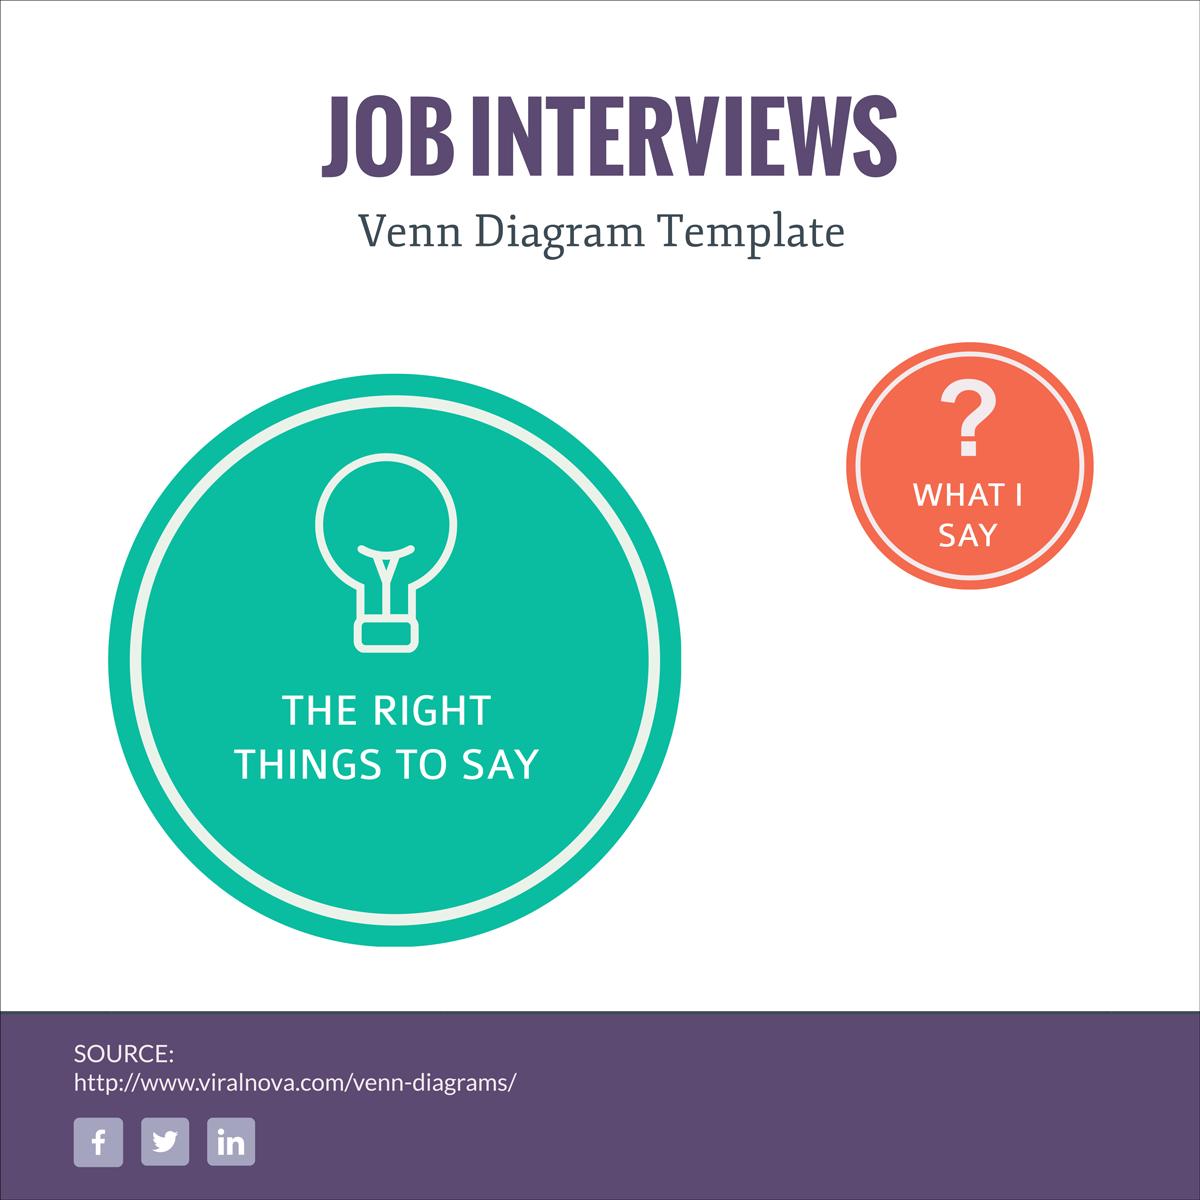 Job interviews venn diagram so true lol funny really funny job interviews venn diagram so true lol funny pooptronica